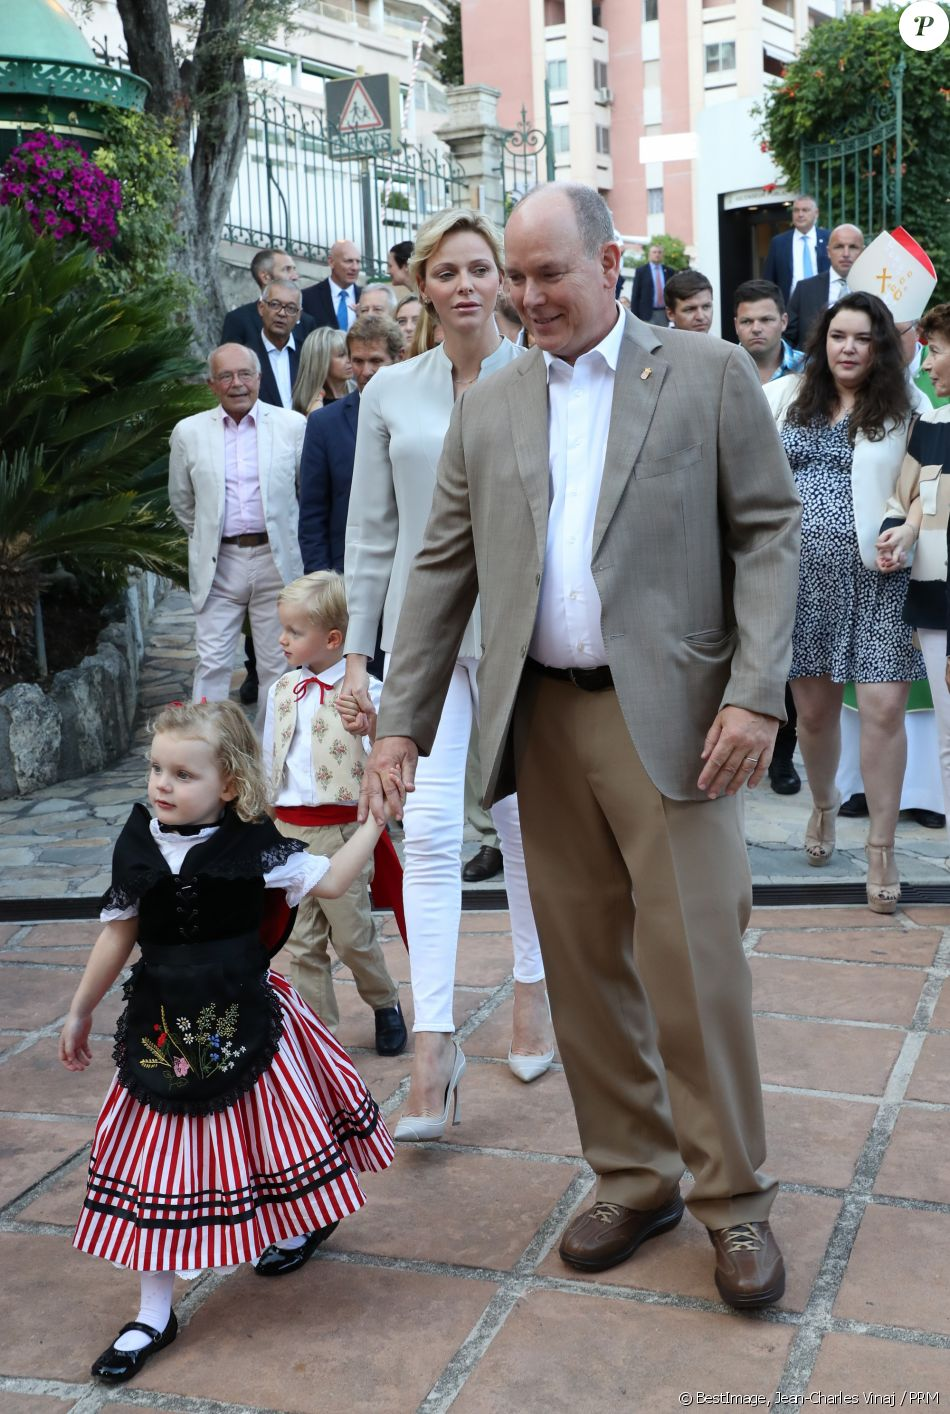 Alberto II y Charlene, Príncipes de Mónaco - Página 11 4280153-la-princesse-charlene-de-monaco-et-le-pr-950x0-2